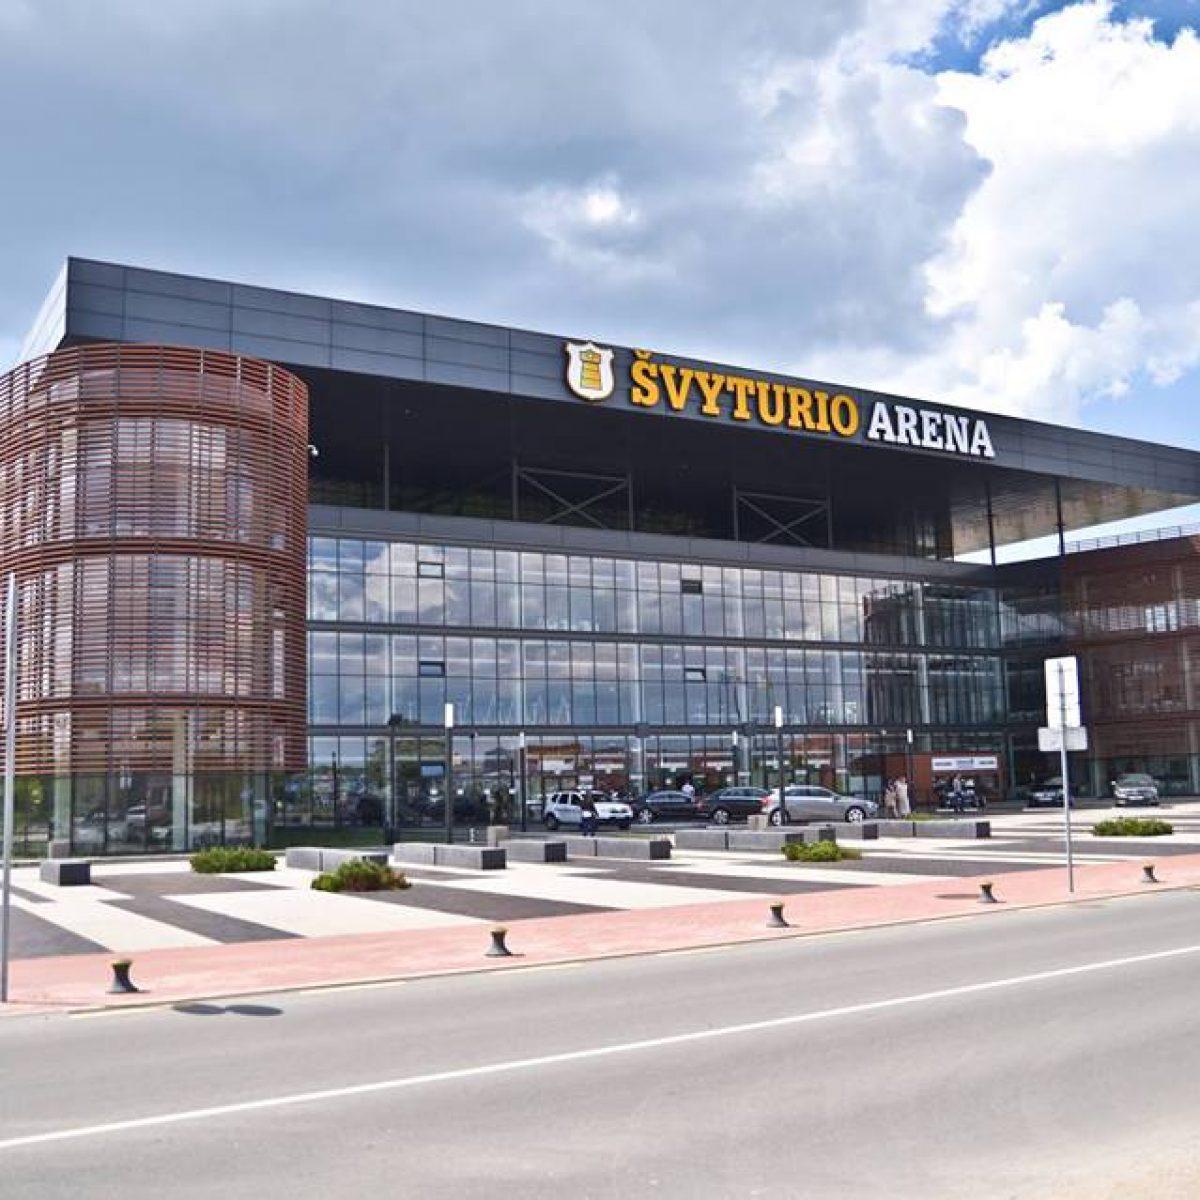 svyturio-arena-klaipeda